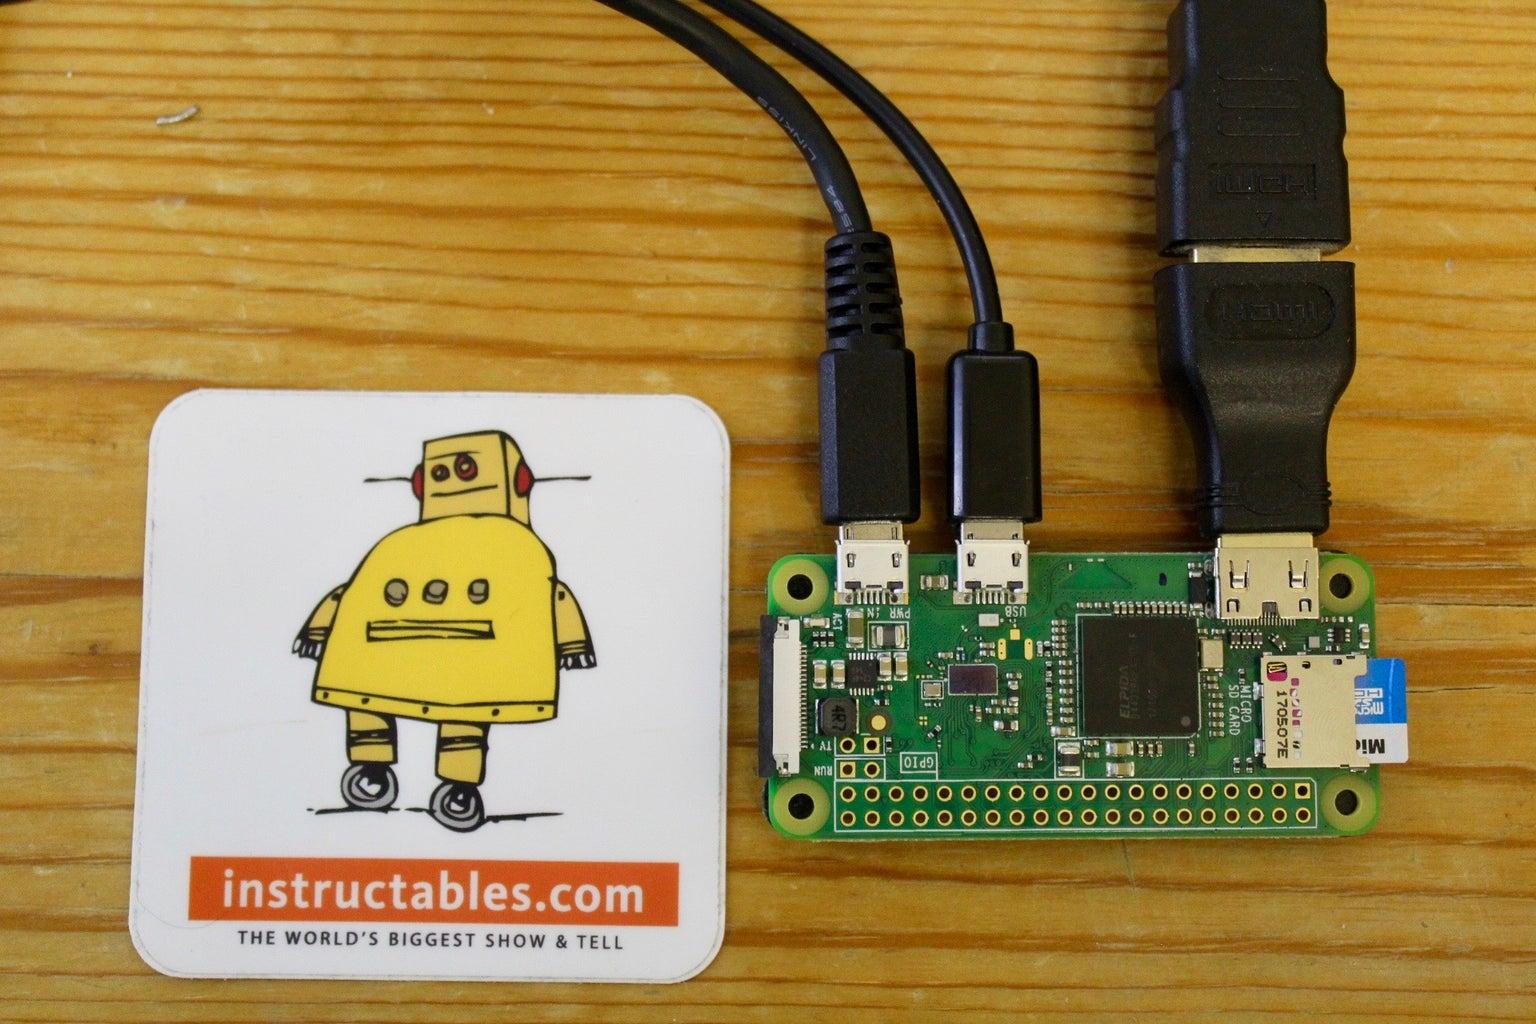 Installing Raspbian to the Raspberry Pi